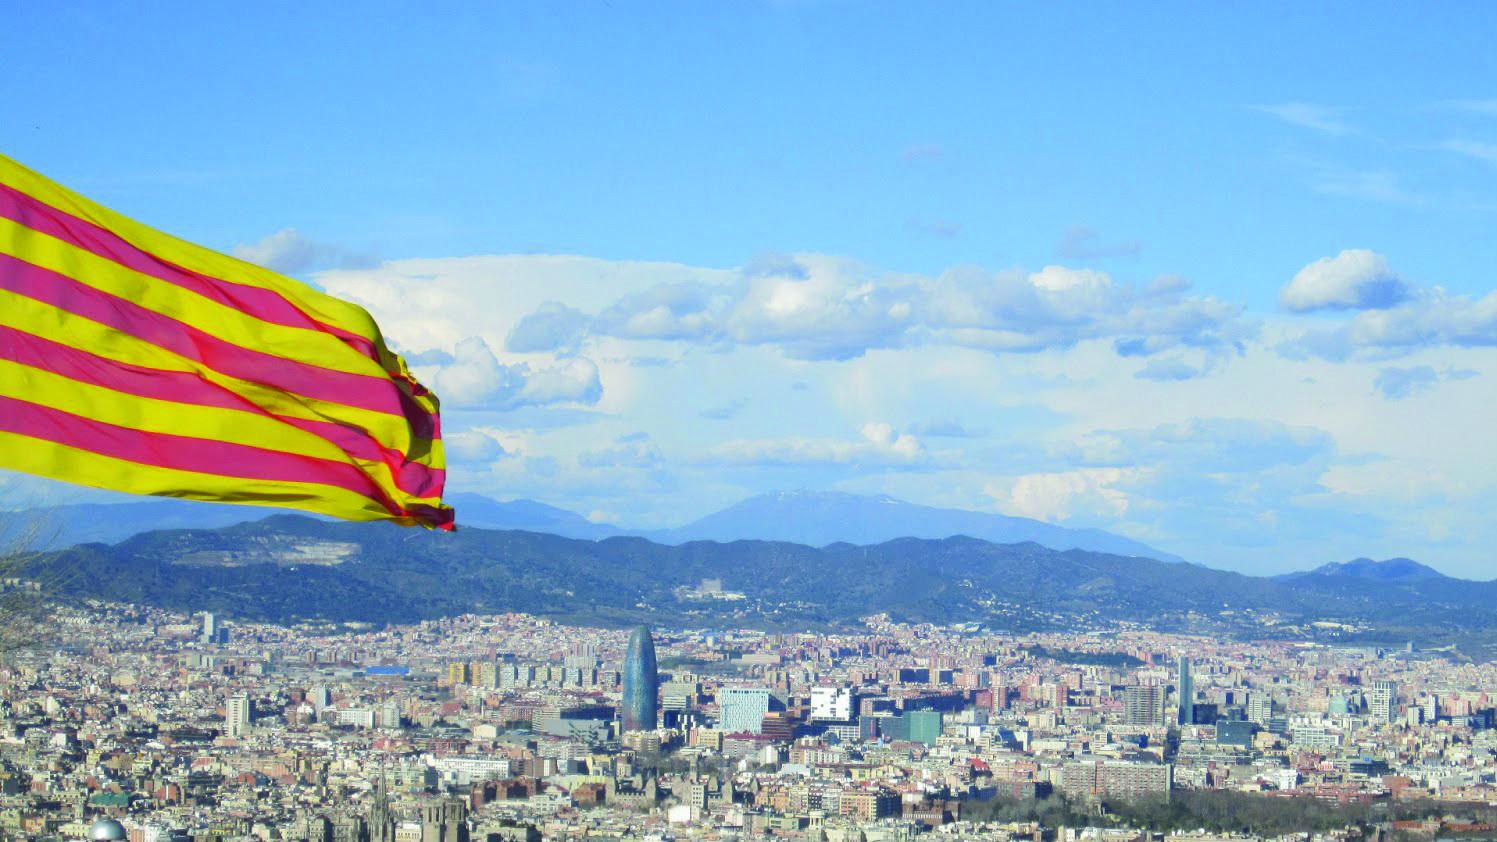 Operators bid for new casinos as Catalonia makes a comeback